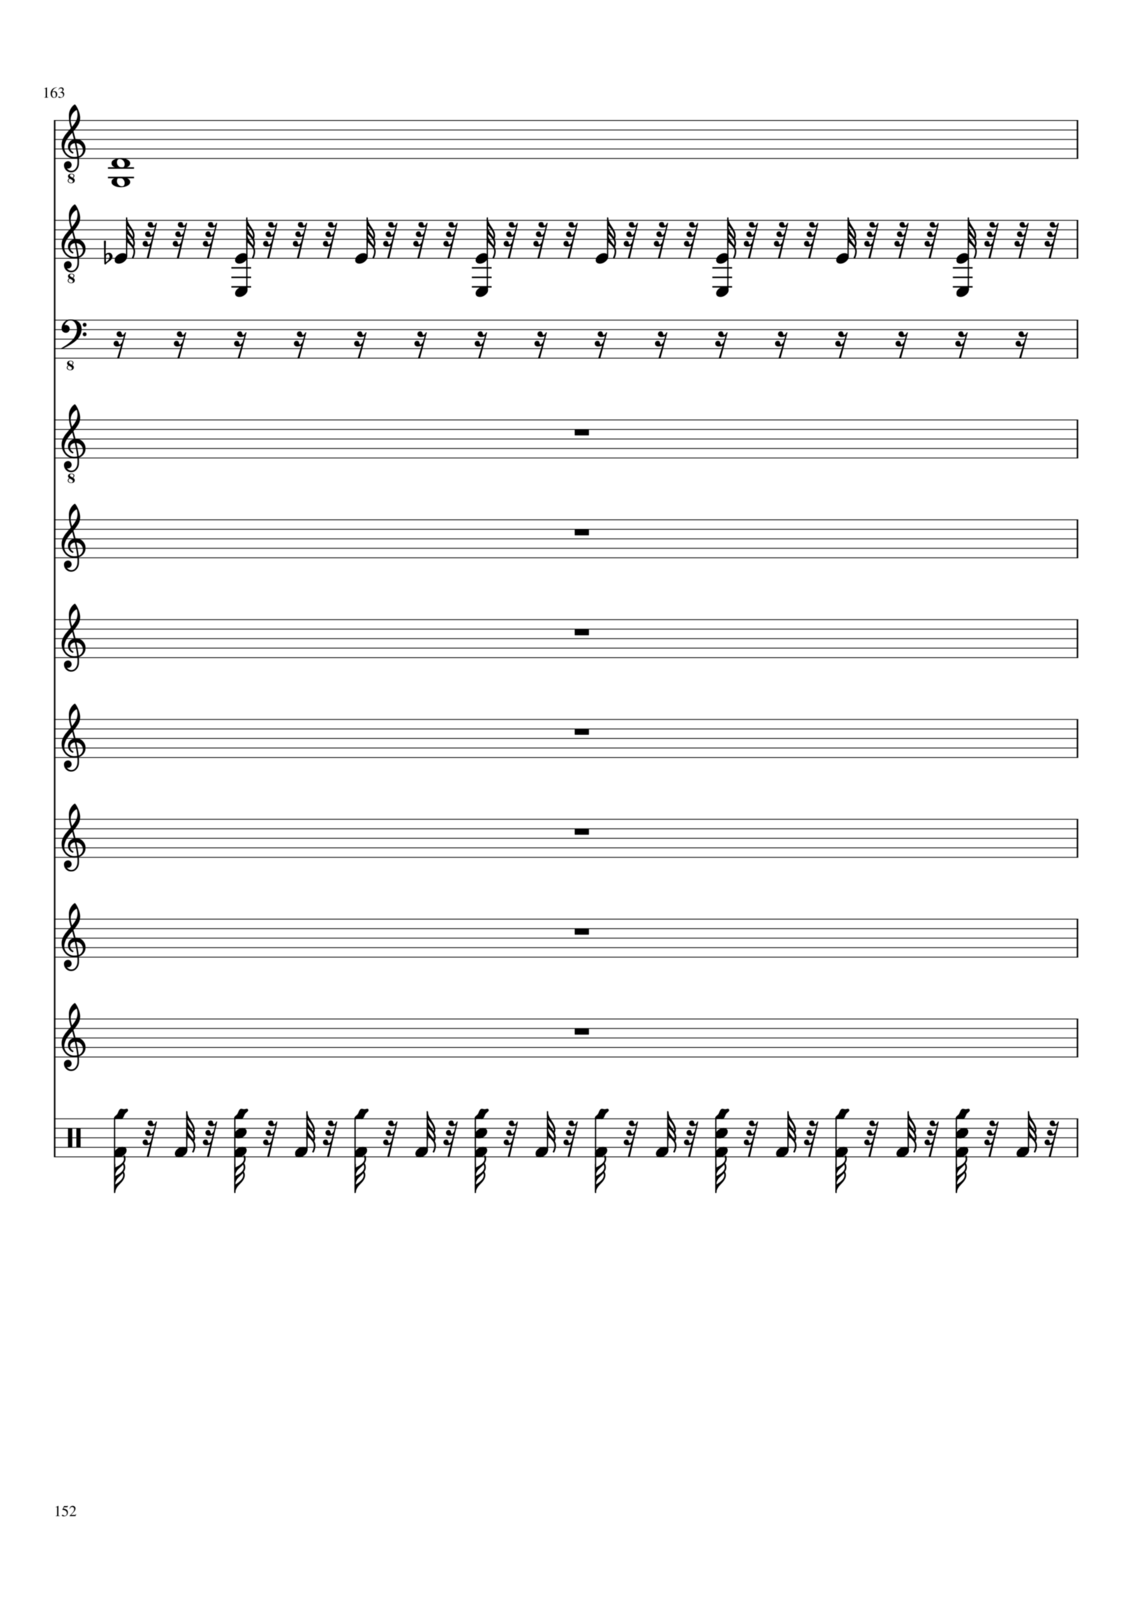 Belyiy sokol slide, Image 152